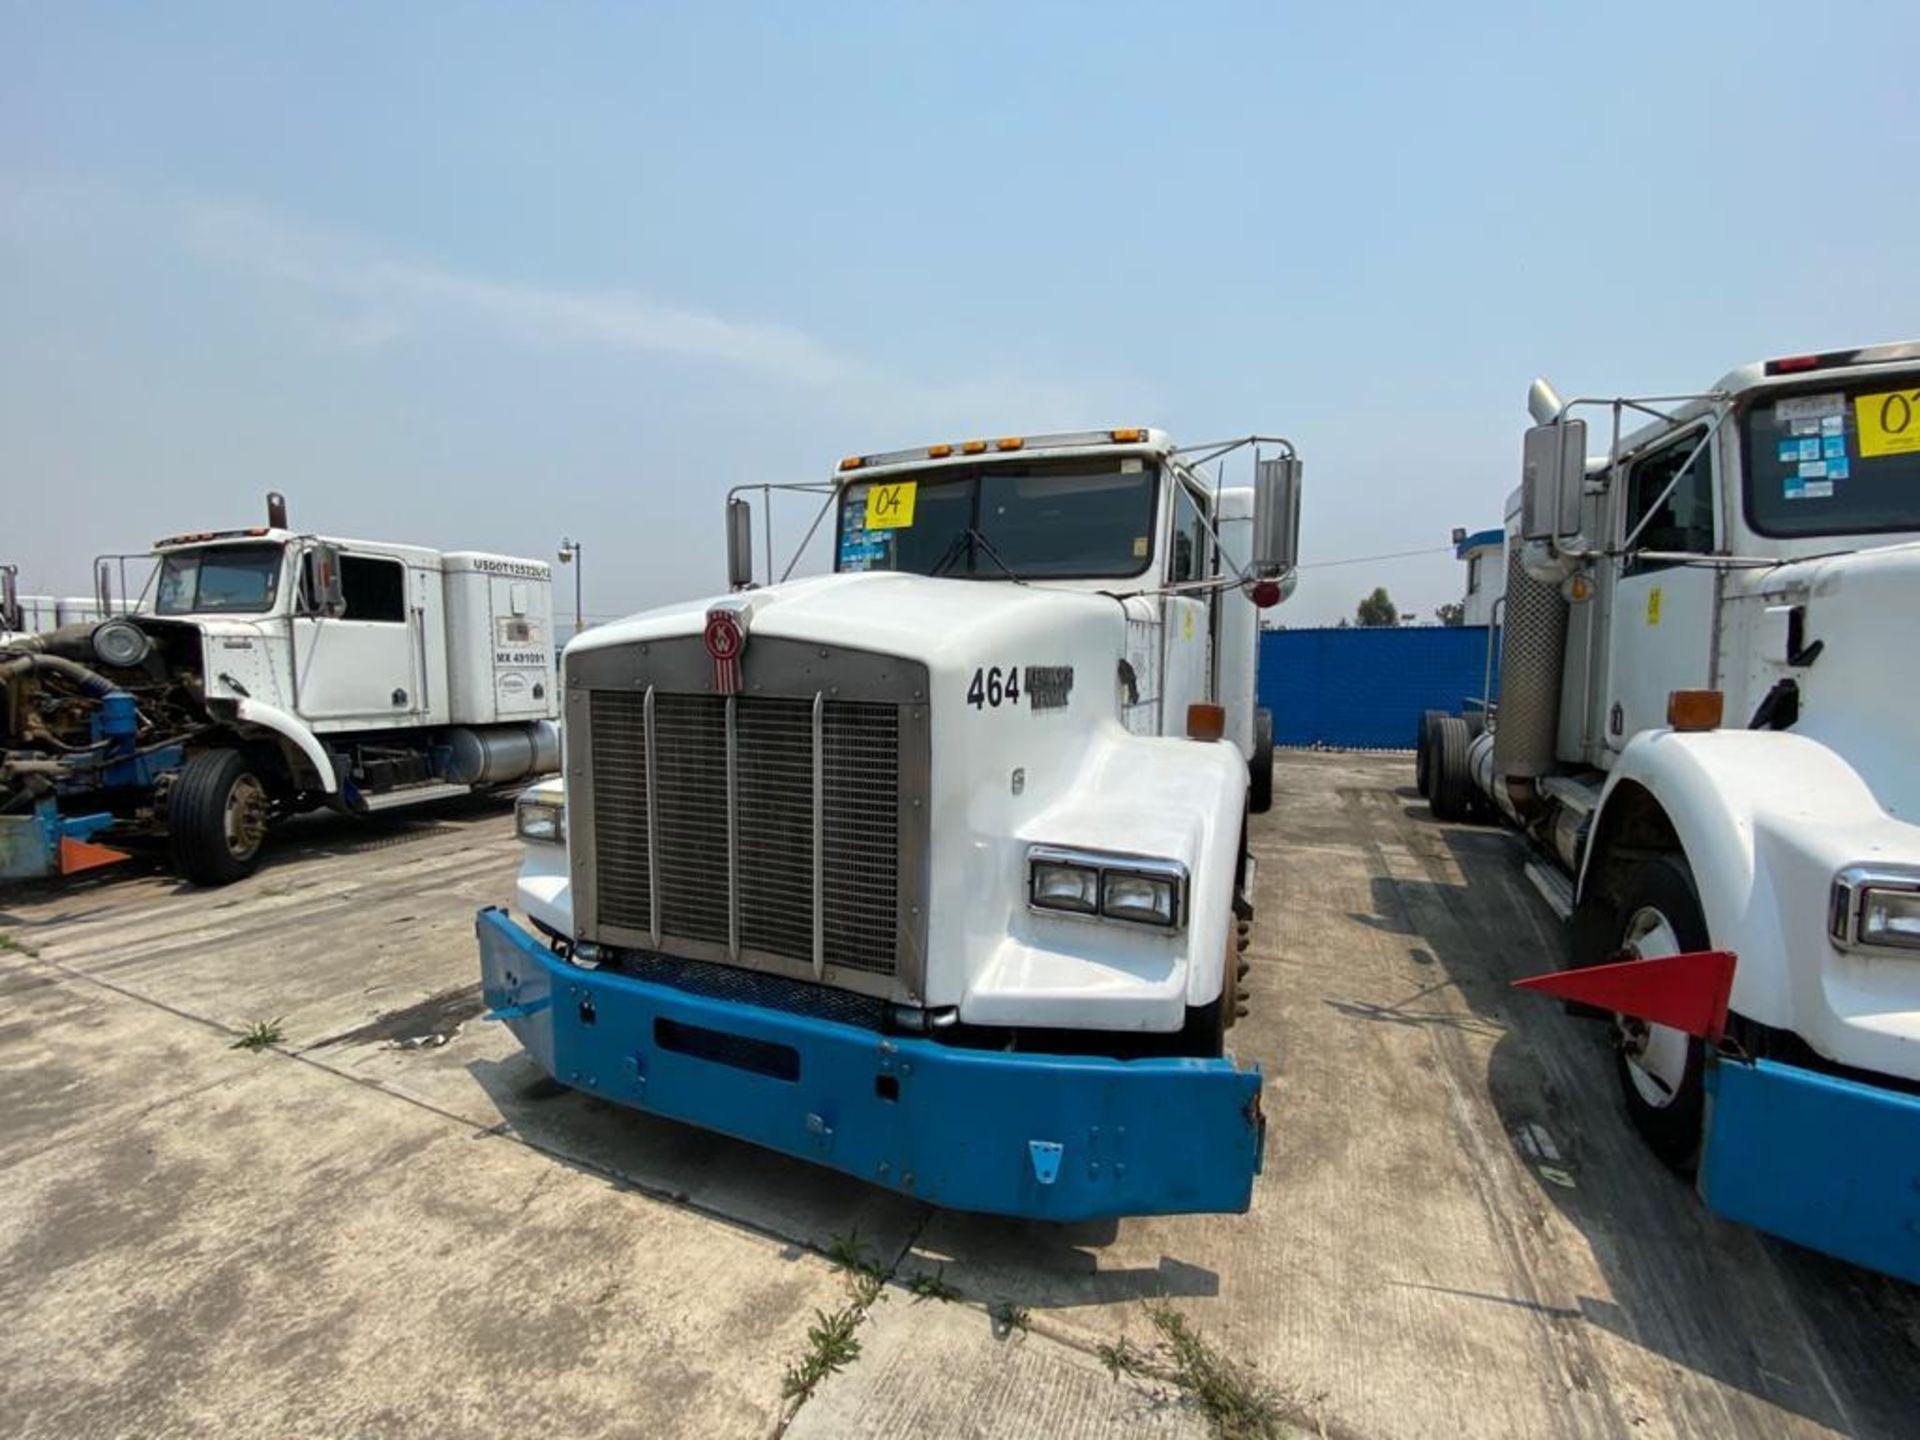 1999 Kenworth Sleeper truck tractor, standard transmission of 18 speeds - Image 8 of 70